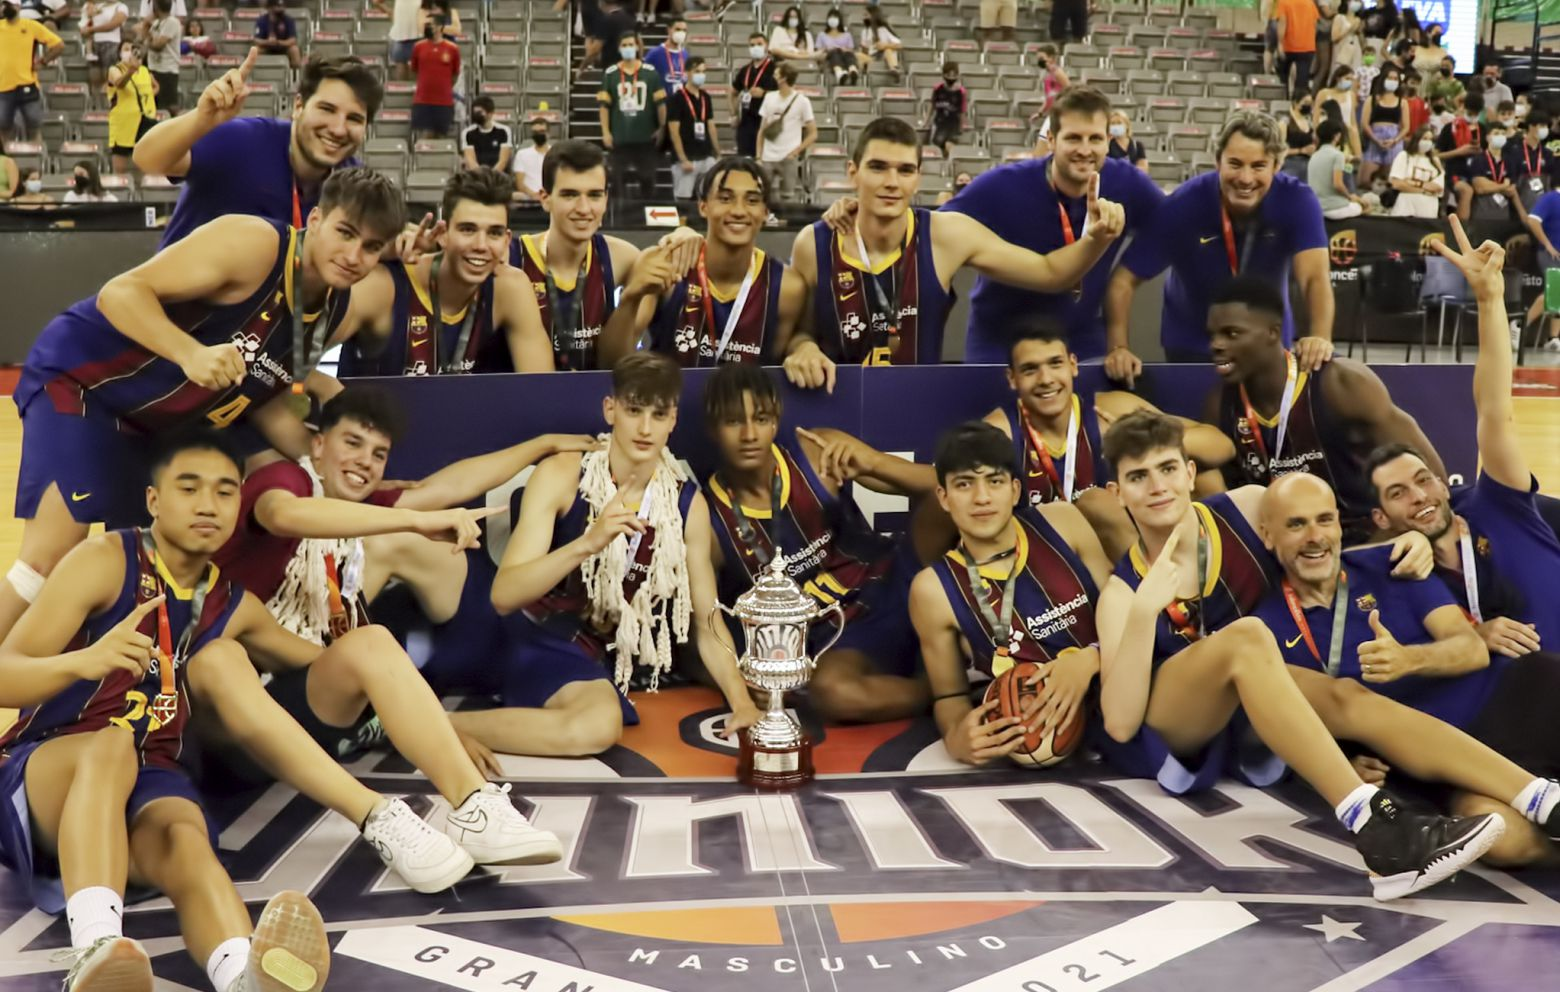 FABIÁN TÉLLEZ has won the U18 Spanish Championship with F.C.Barcelona